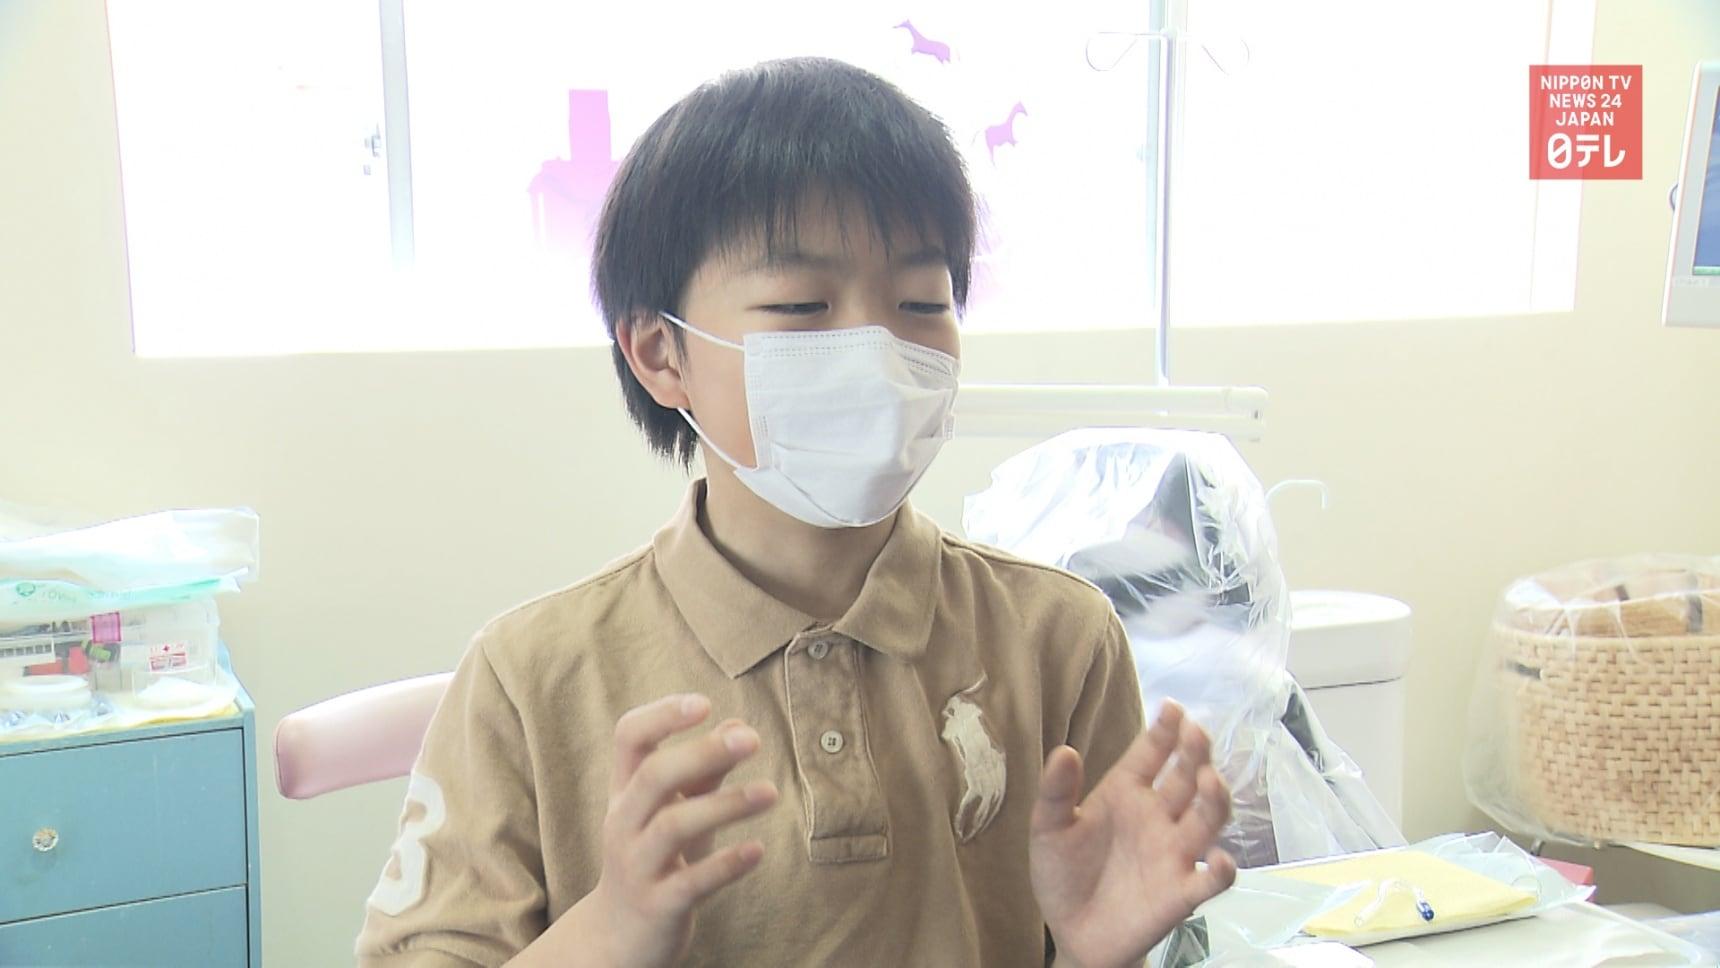 6th Grader Makes & Donates Face Shields